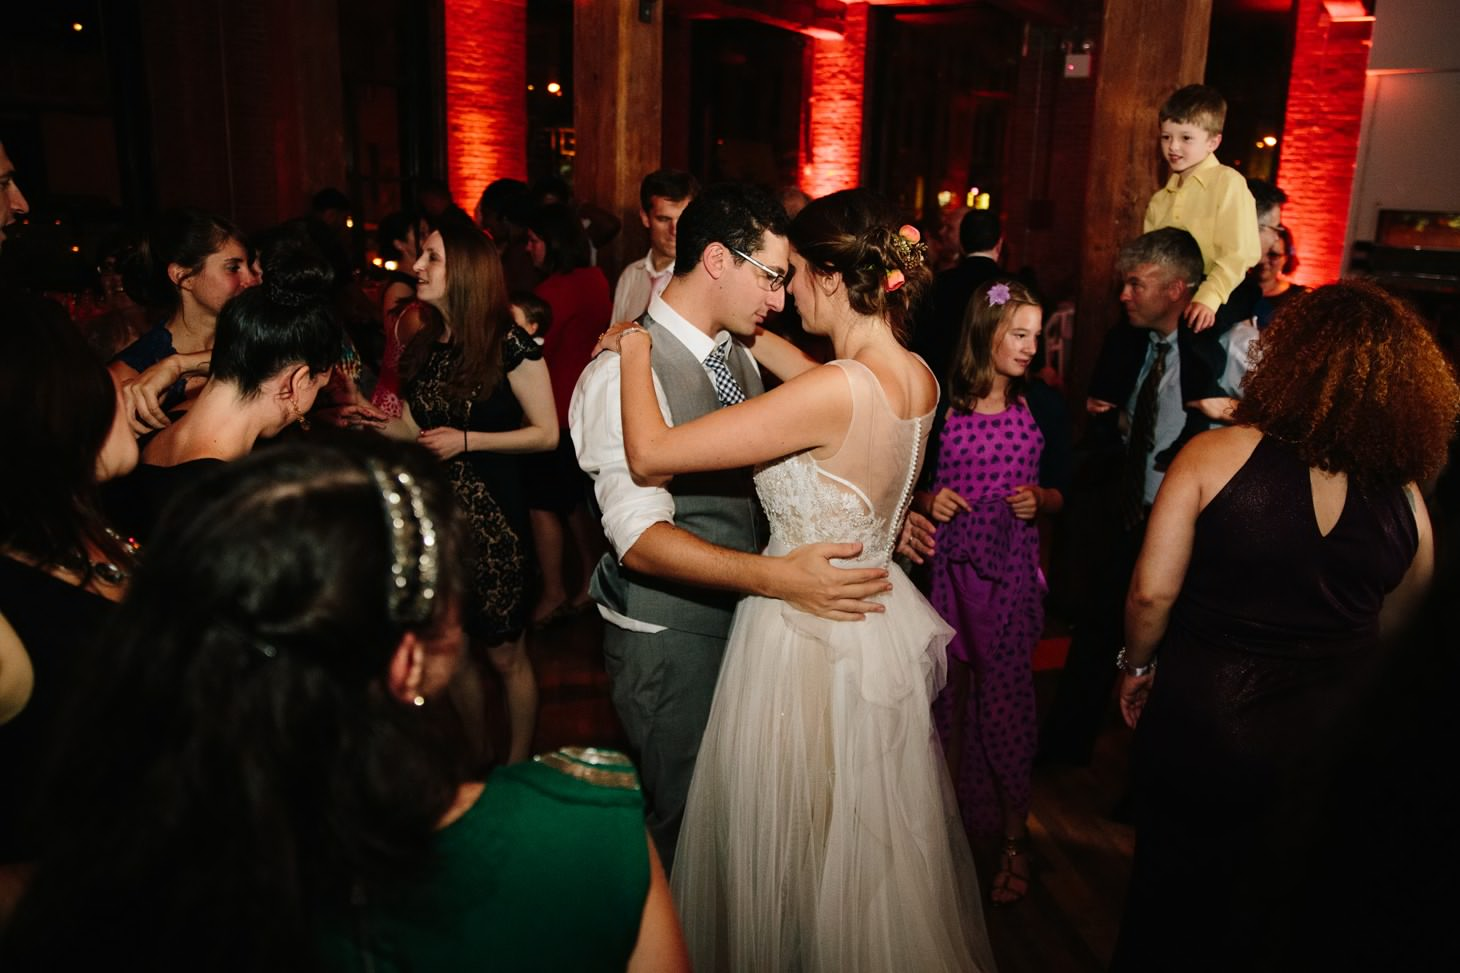 059-nyc-dumbo-loft-brooklyn-wedding-photographer-smitten-chickens-photo-.jpg